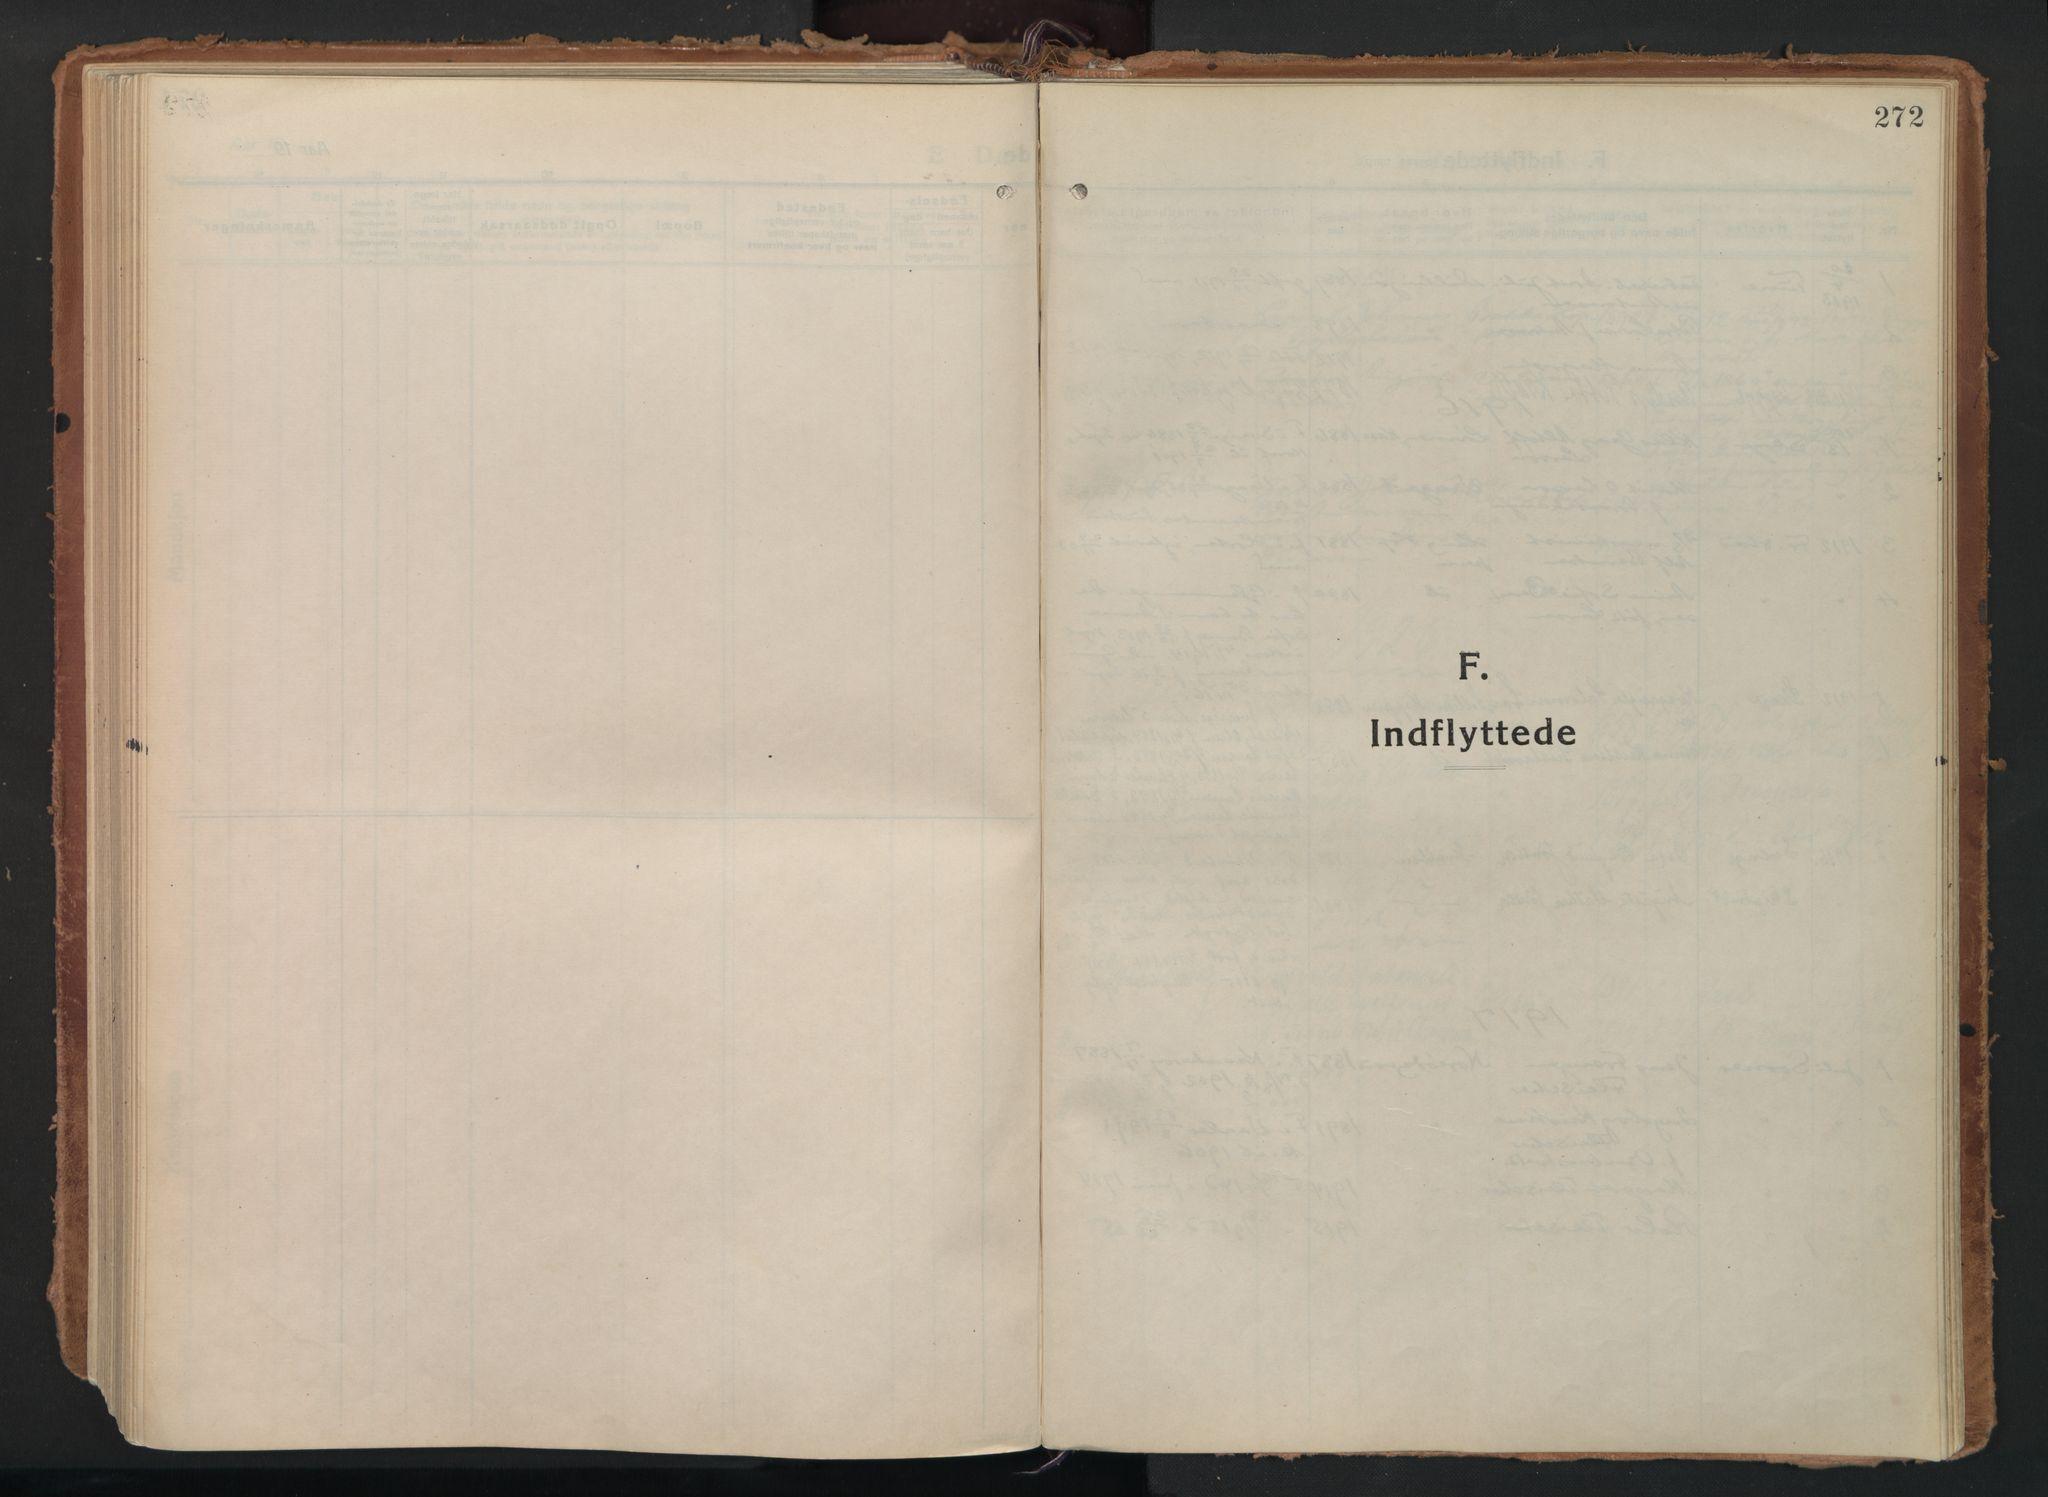 SAO, Moss prestekontor Kirkebøker, F/Fc/Fac/L0004: Ministerialbok nr. III 4, 1915-1929, s. 272